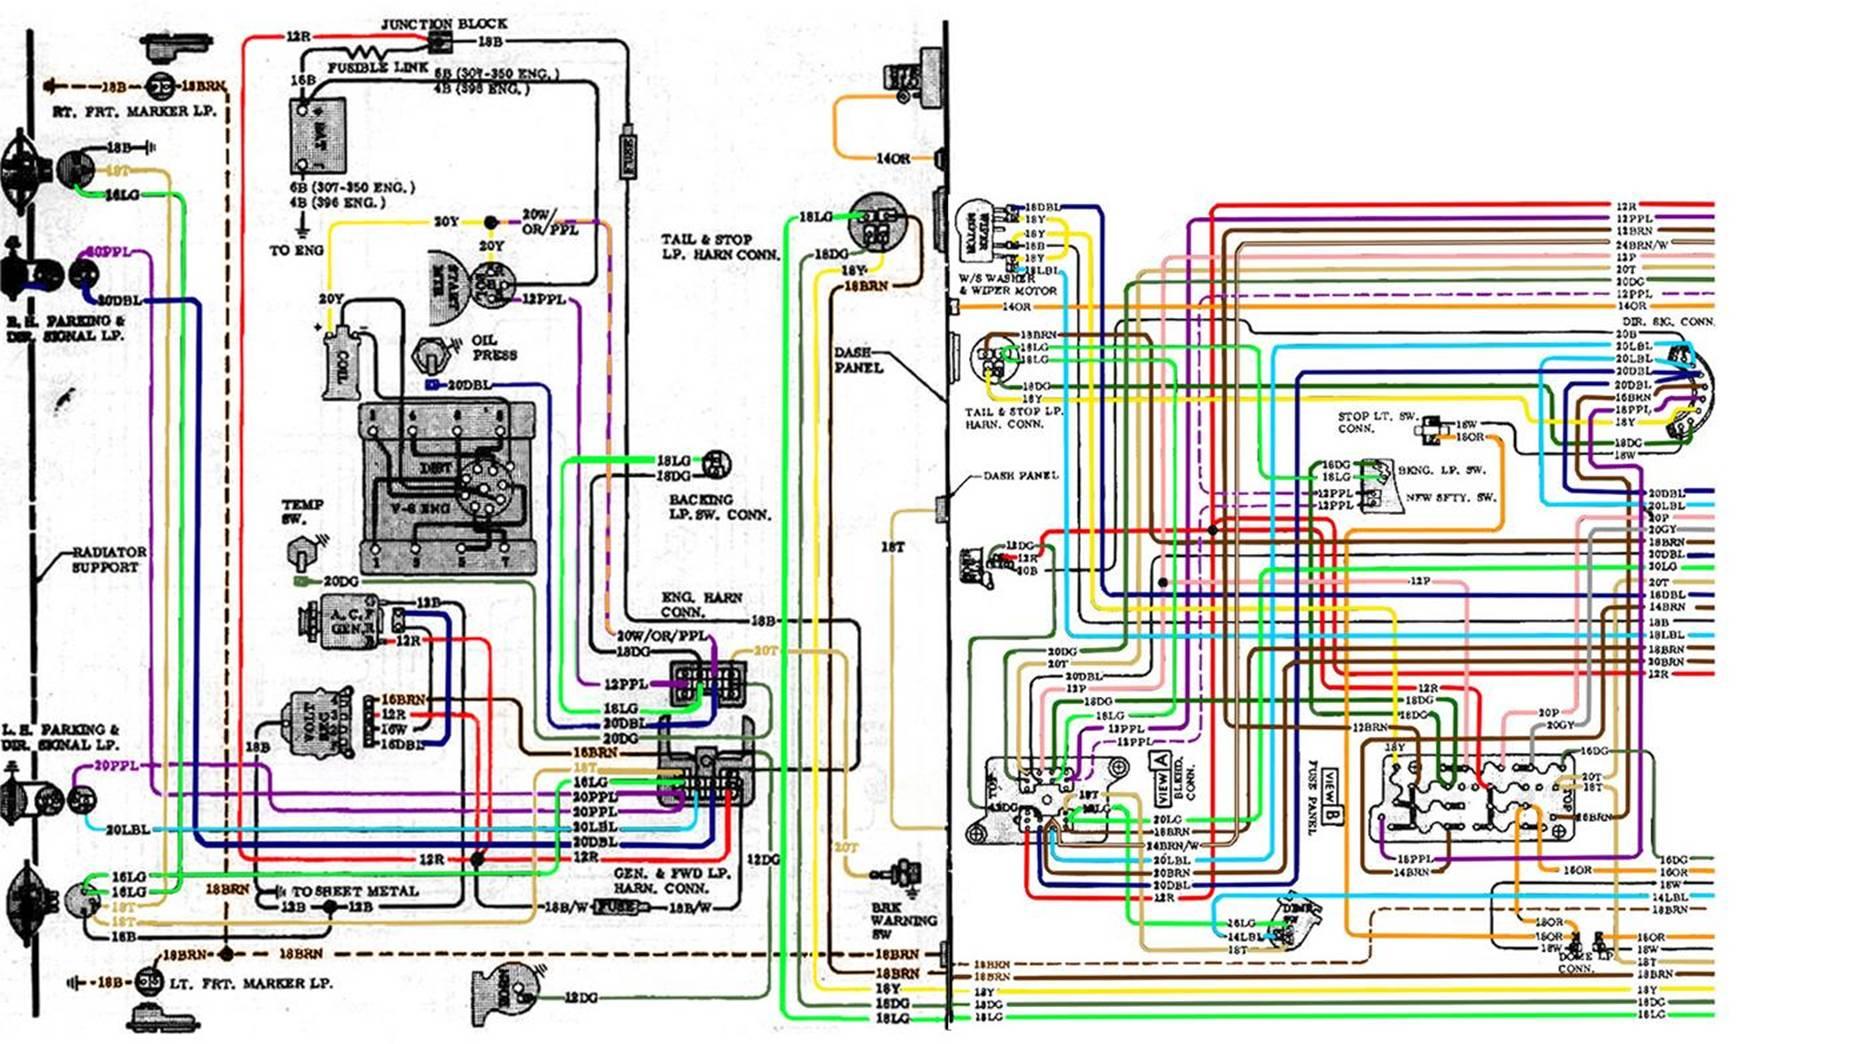 67-72 Chevy Wiring Diagram